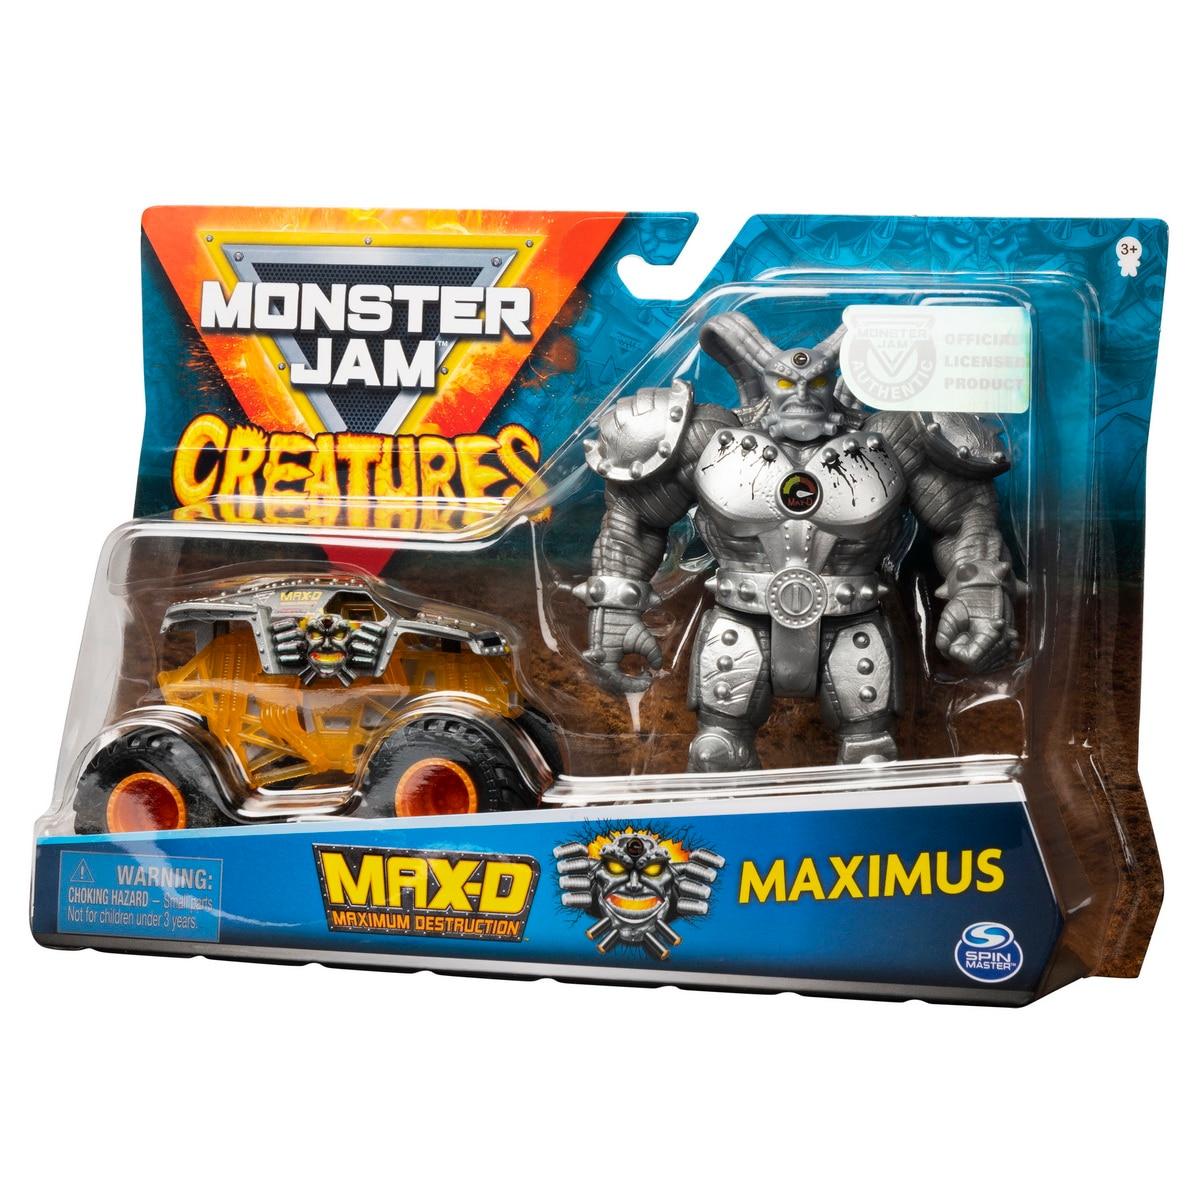 Fotografie Set de joaca Monster Jam Creatures - Max D si Maximus